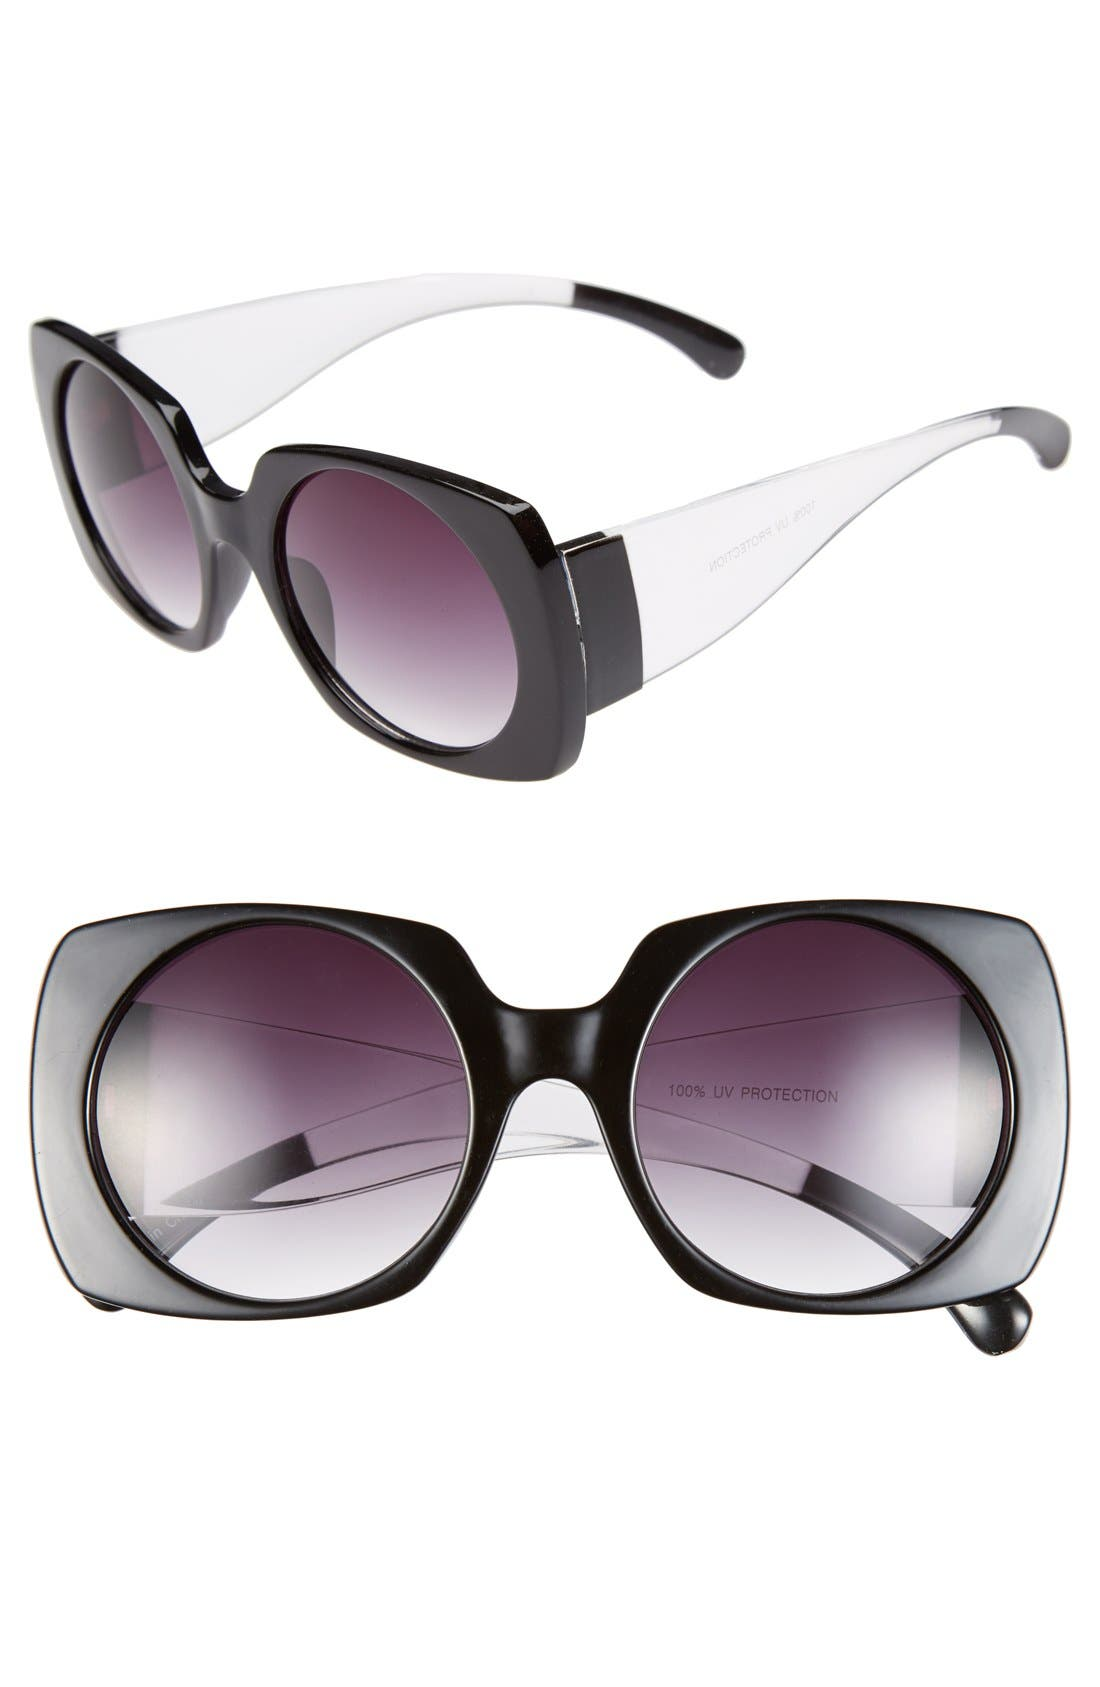 Main Image - FE NY 53mm Oversized Square Sunglasses